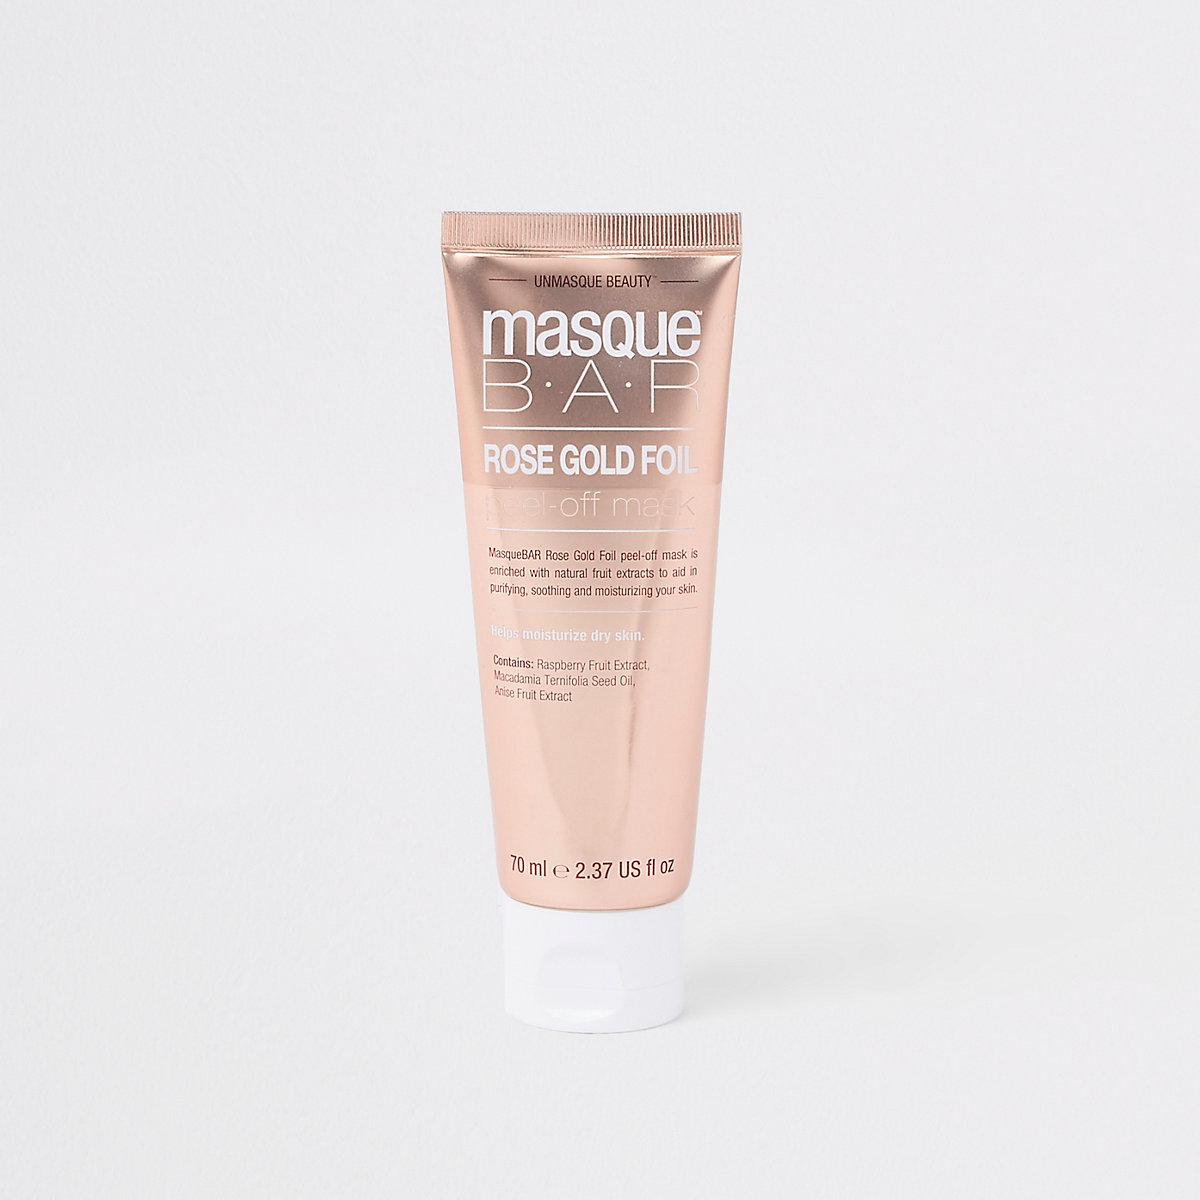 Masque Bar rose gold face mask tube